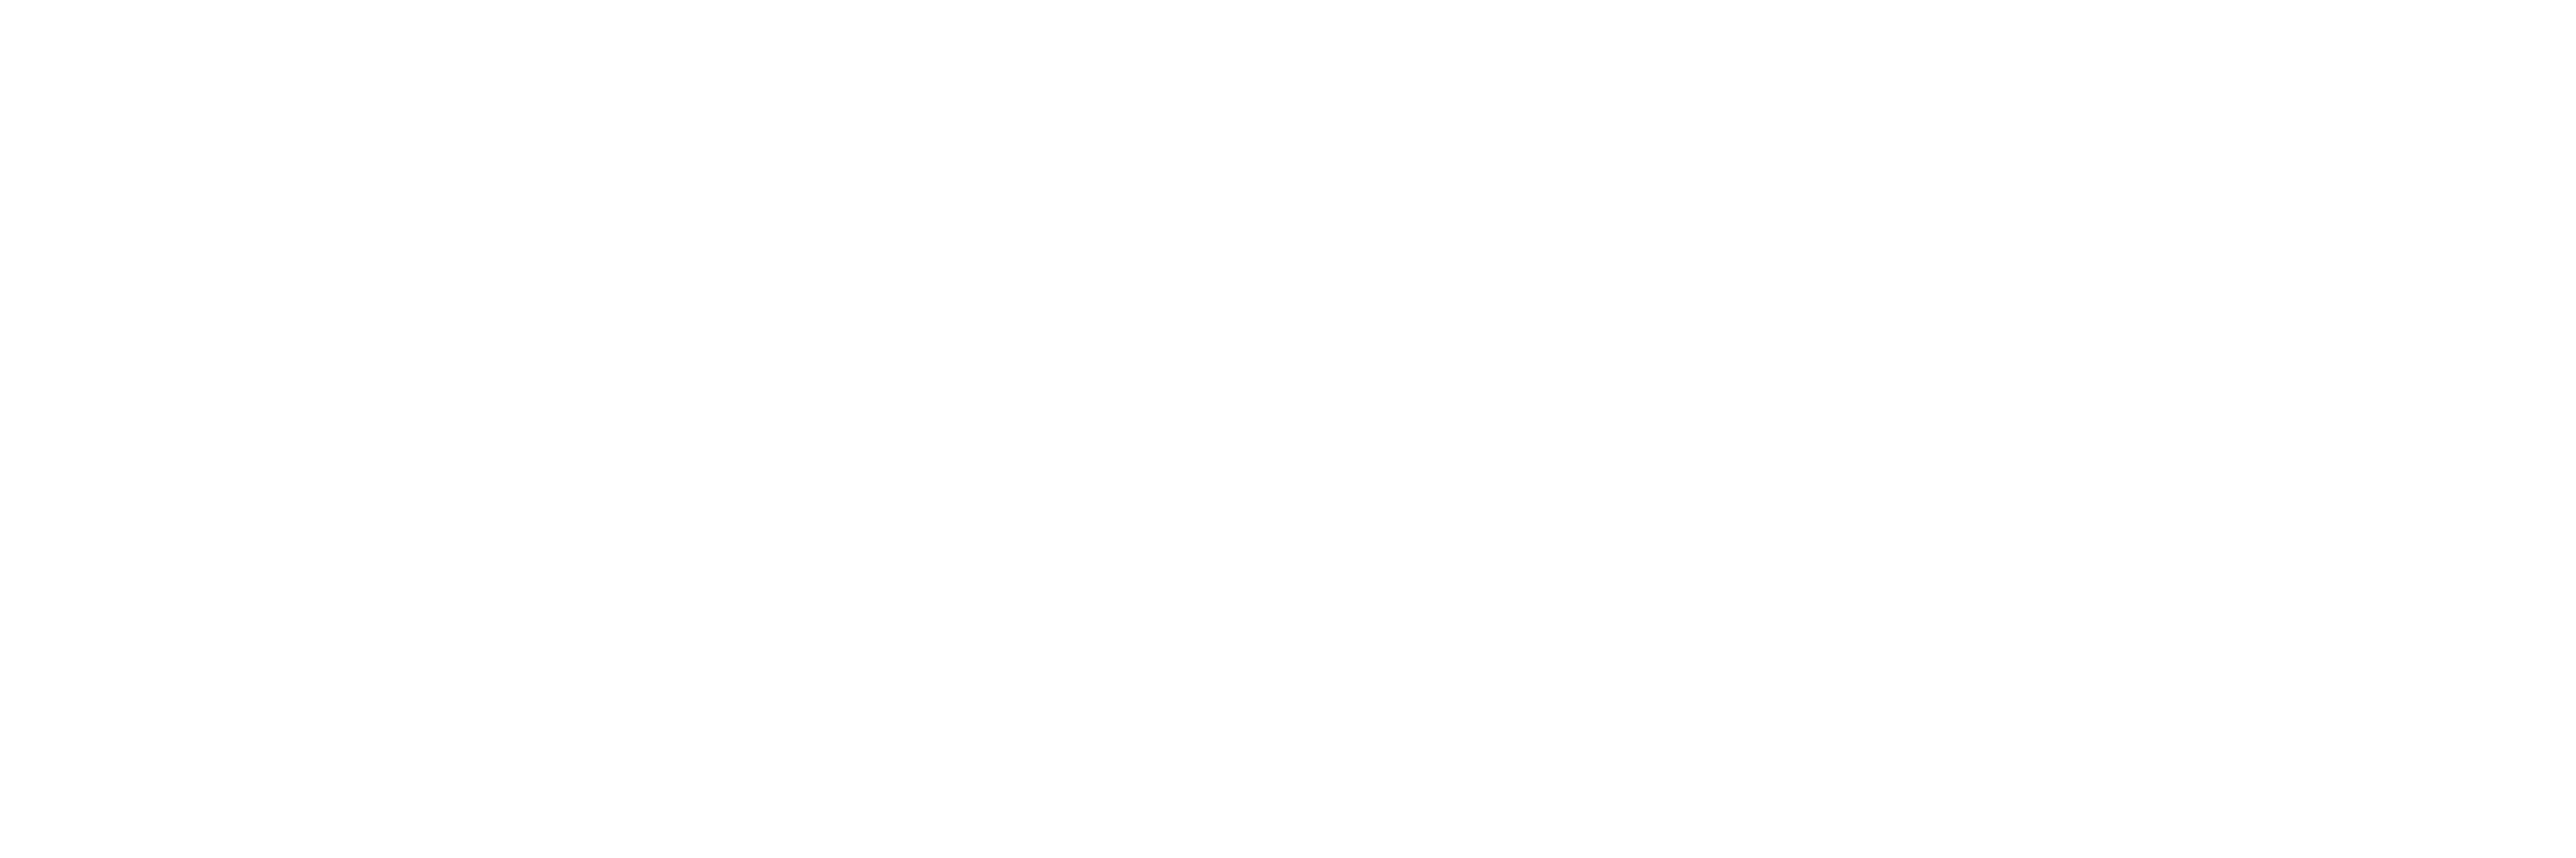 Geoparc Chablais